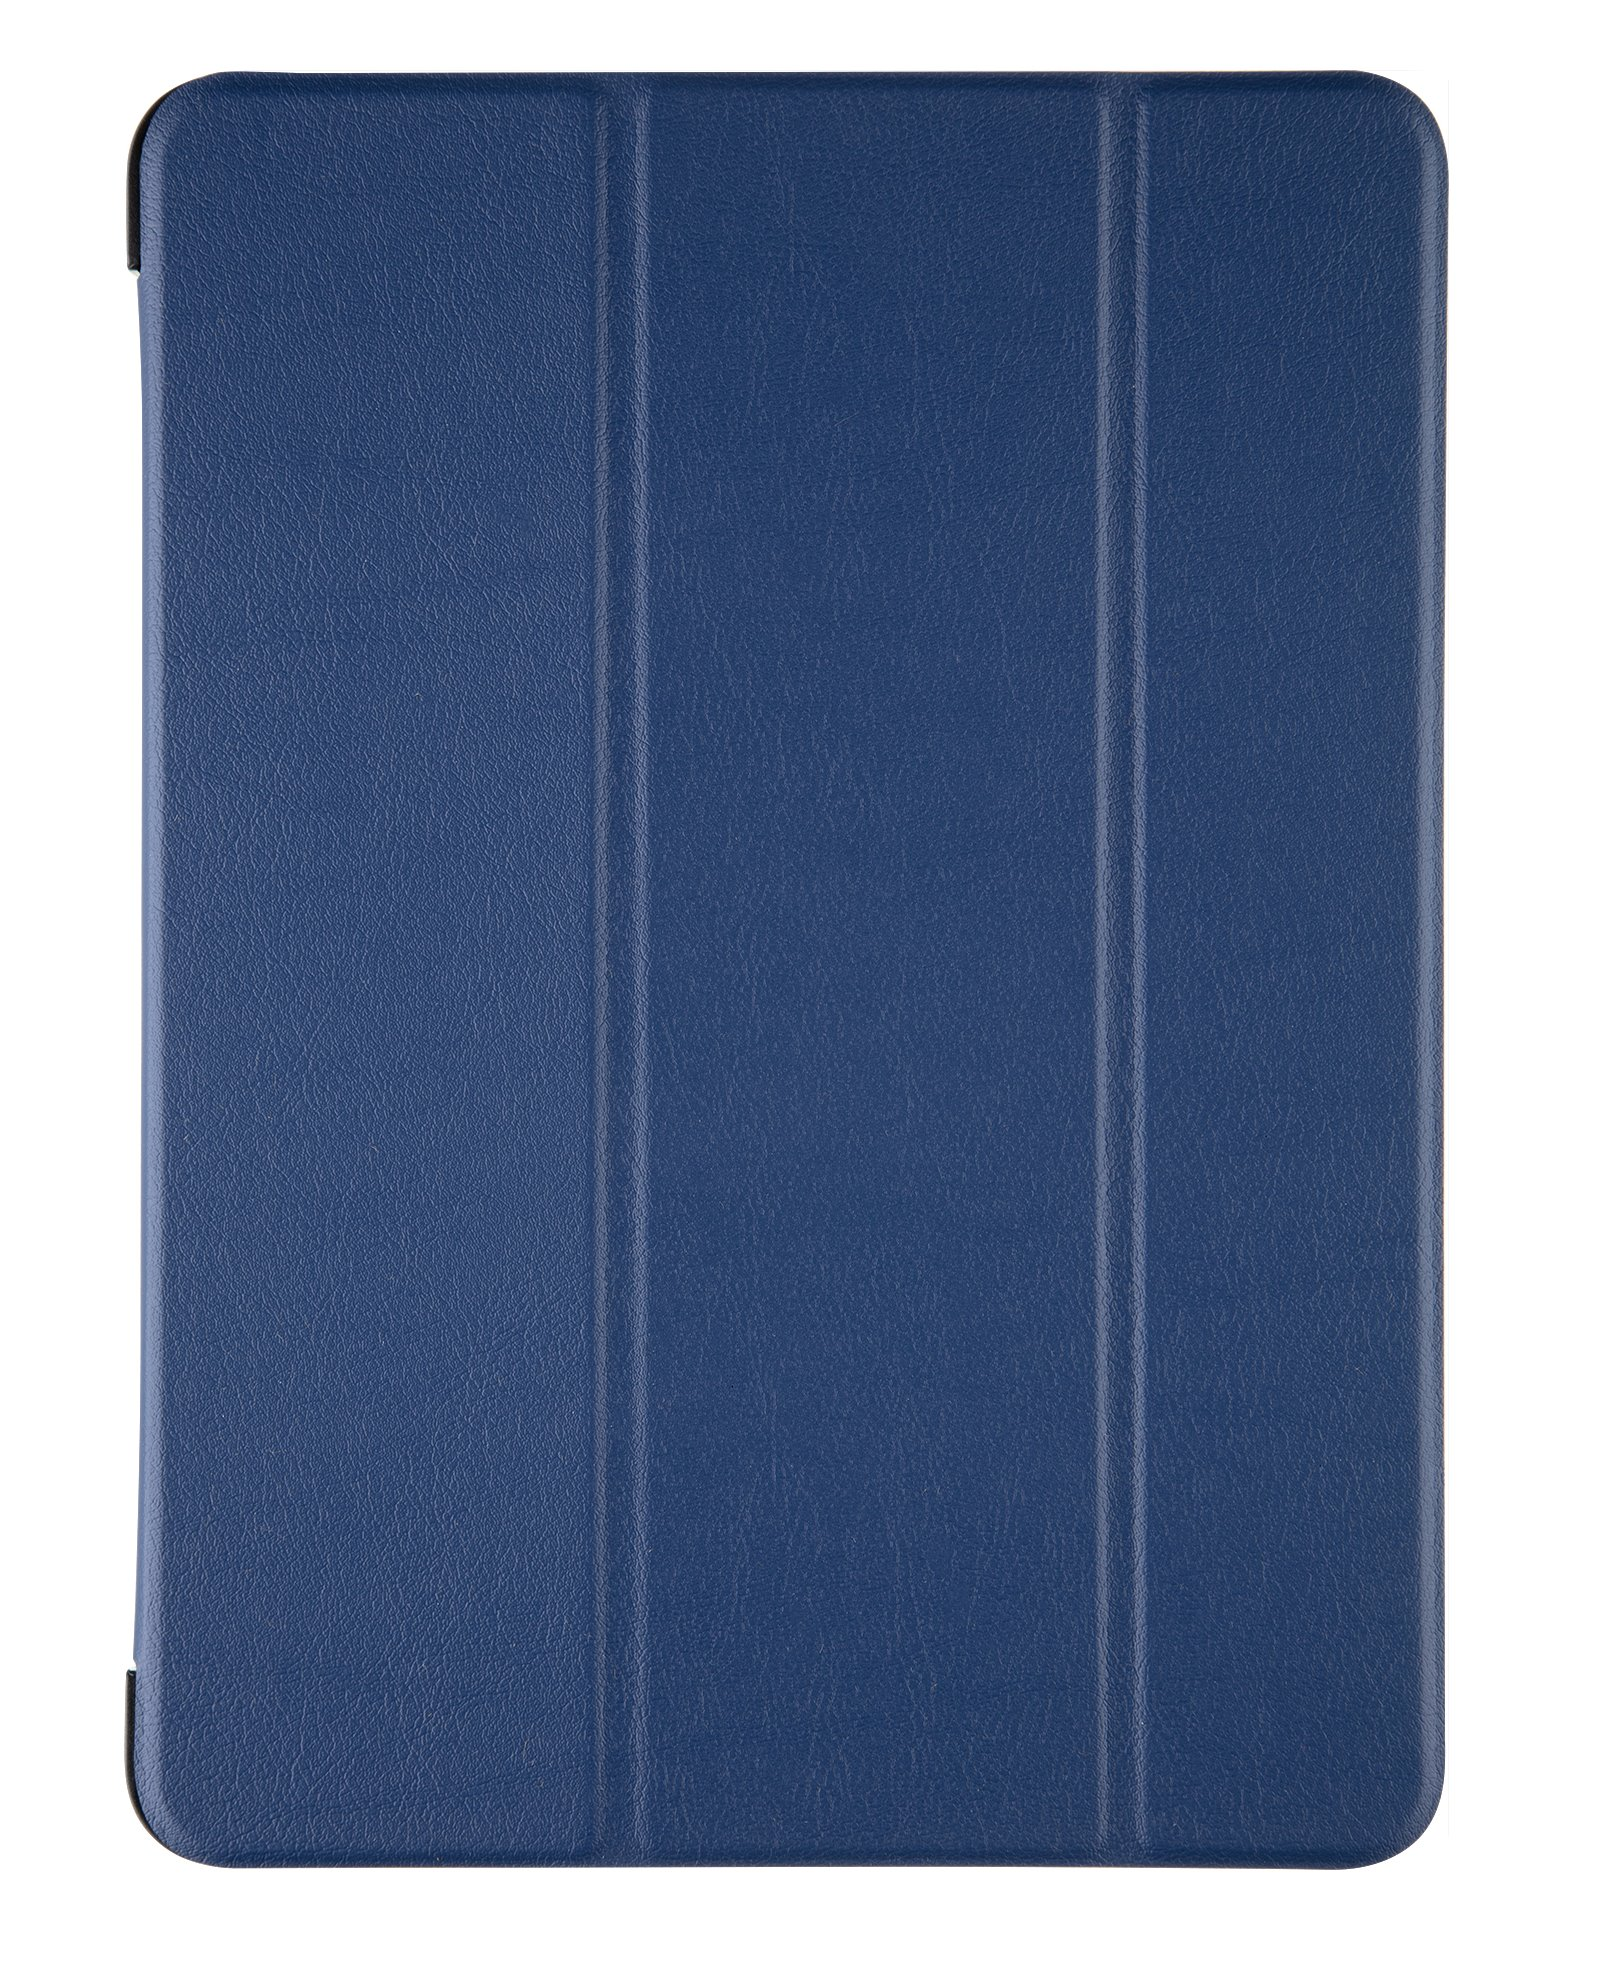 Tactical Book Tri Fold Pouzdro pro Samsung T730/T736/T970/T975 Galaxy Tab S7 FE 5G / S7+ 12.4 Blue 8596311154287